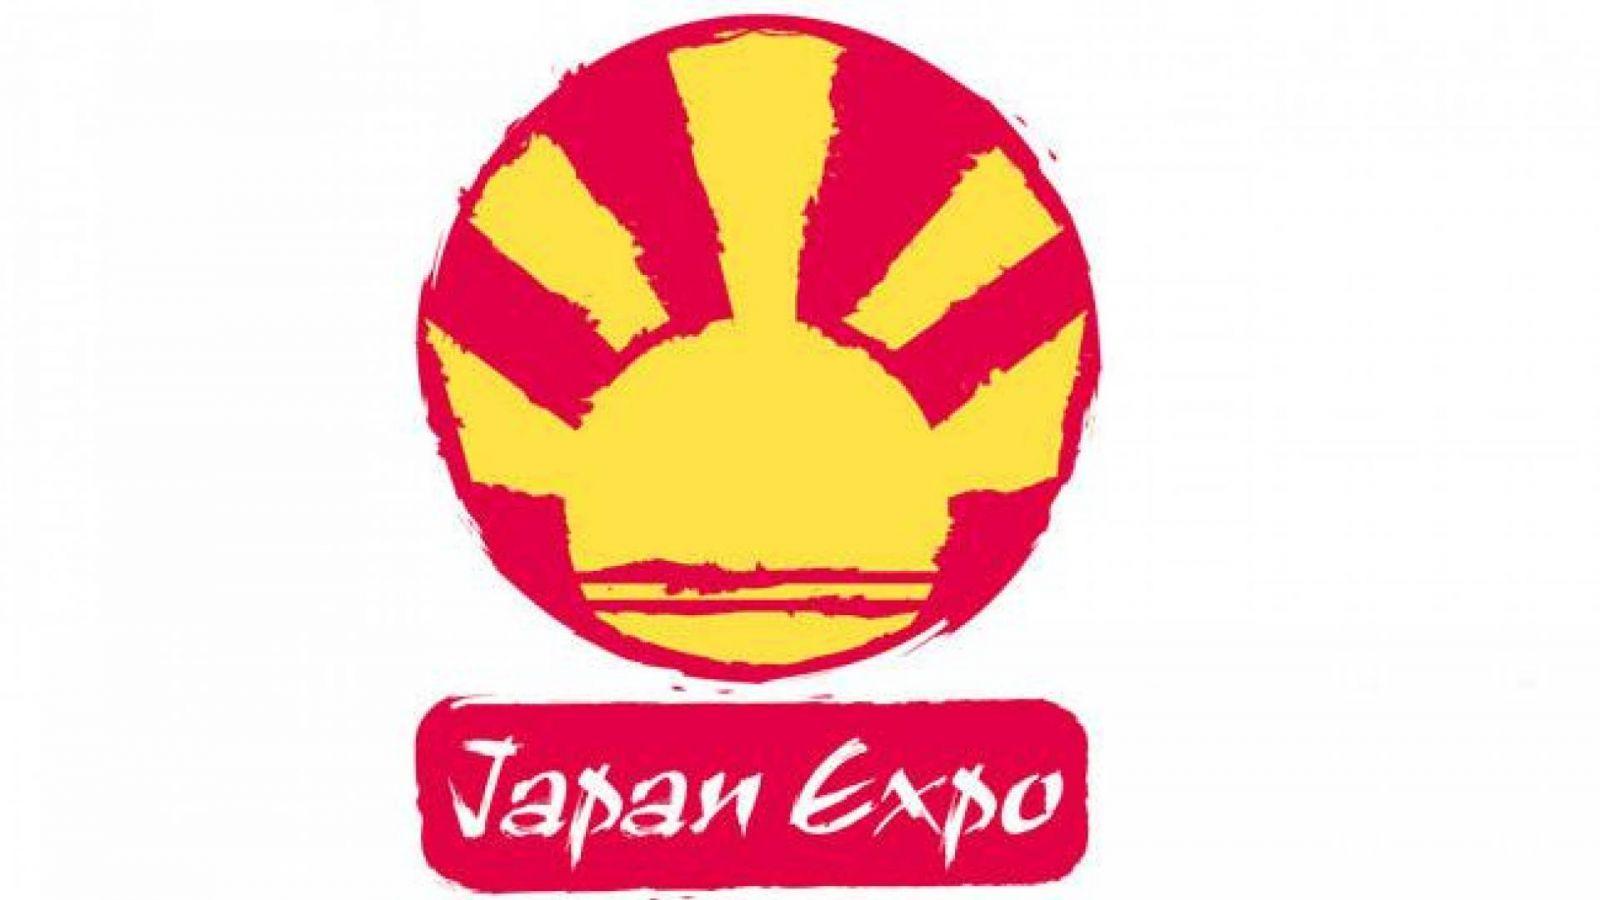 Iwasa Misaki et Hayabusa à Japan Expo © Japan Expo